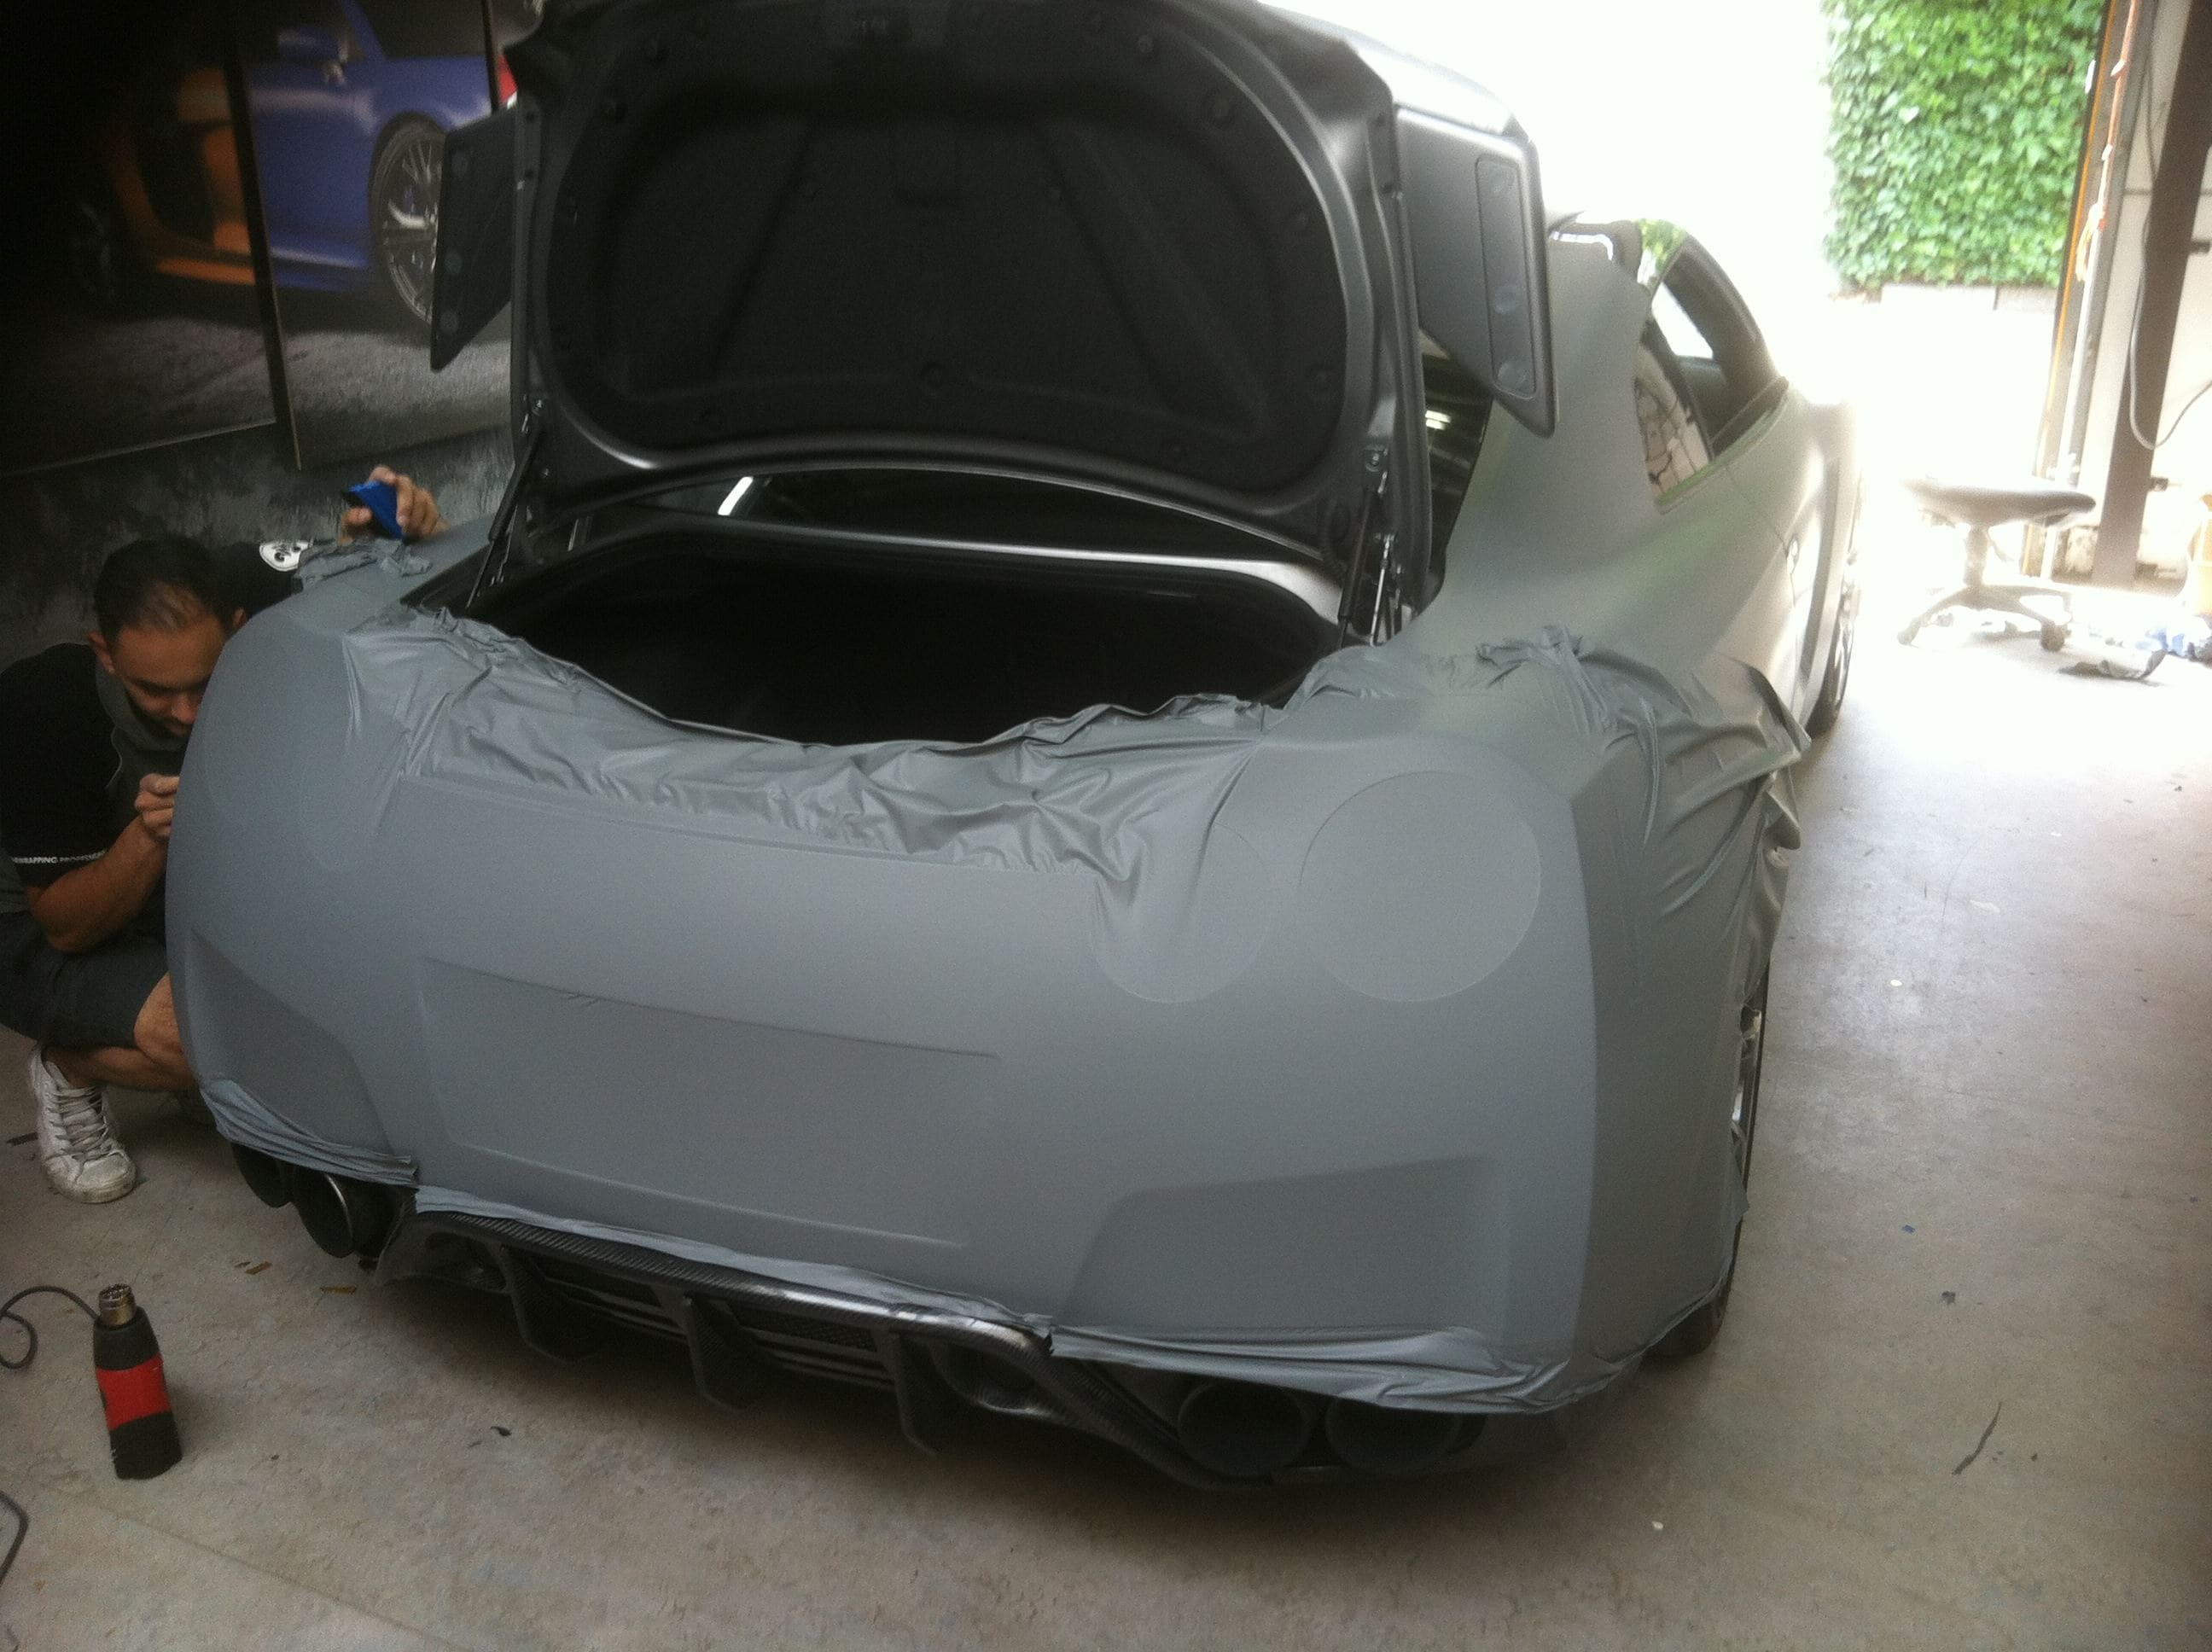 Nissan GT-R met Mat Grijze Wrap, Carwrapping door Wrapmyride.nu Foto-nr:6548, ©2021